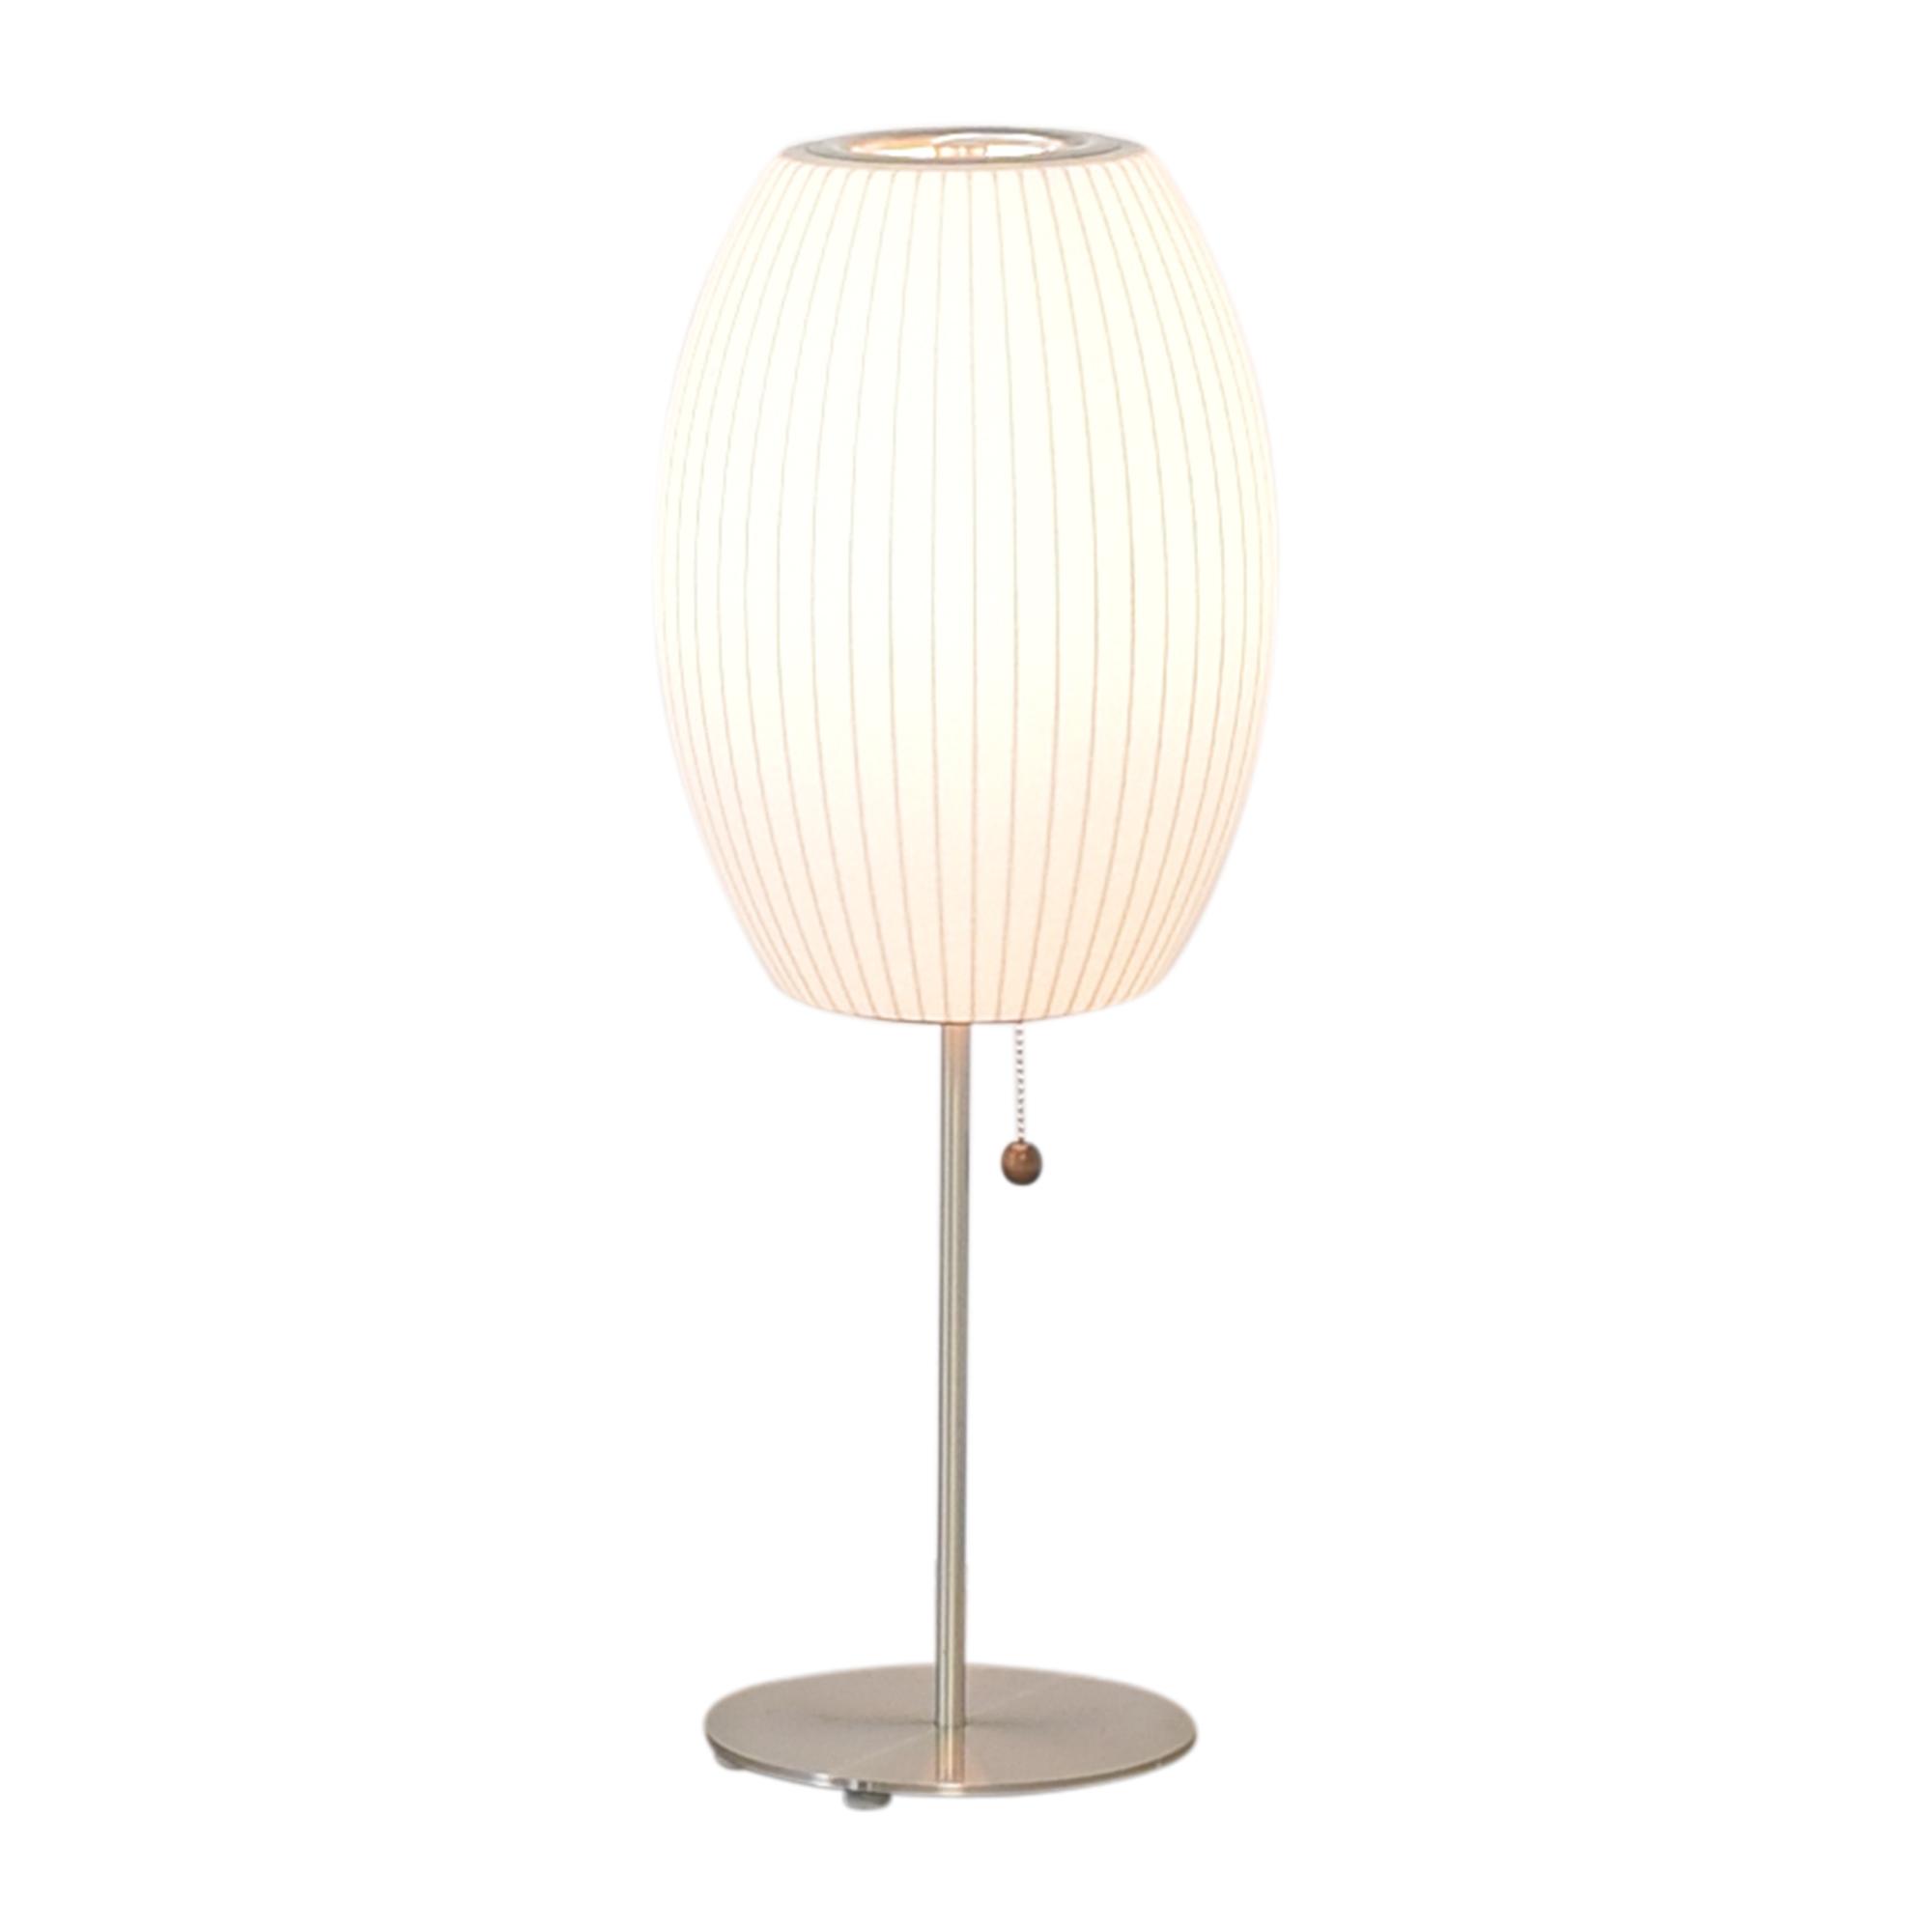 buy Modernica Nelson Bubble Lamps Cigar Lotus Table Lamp Modernica Decor